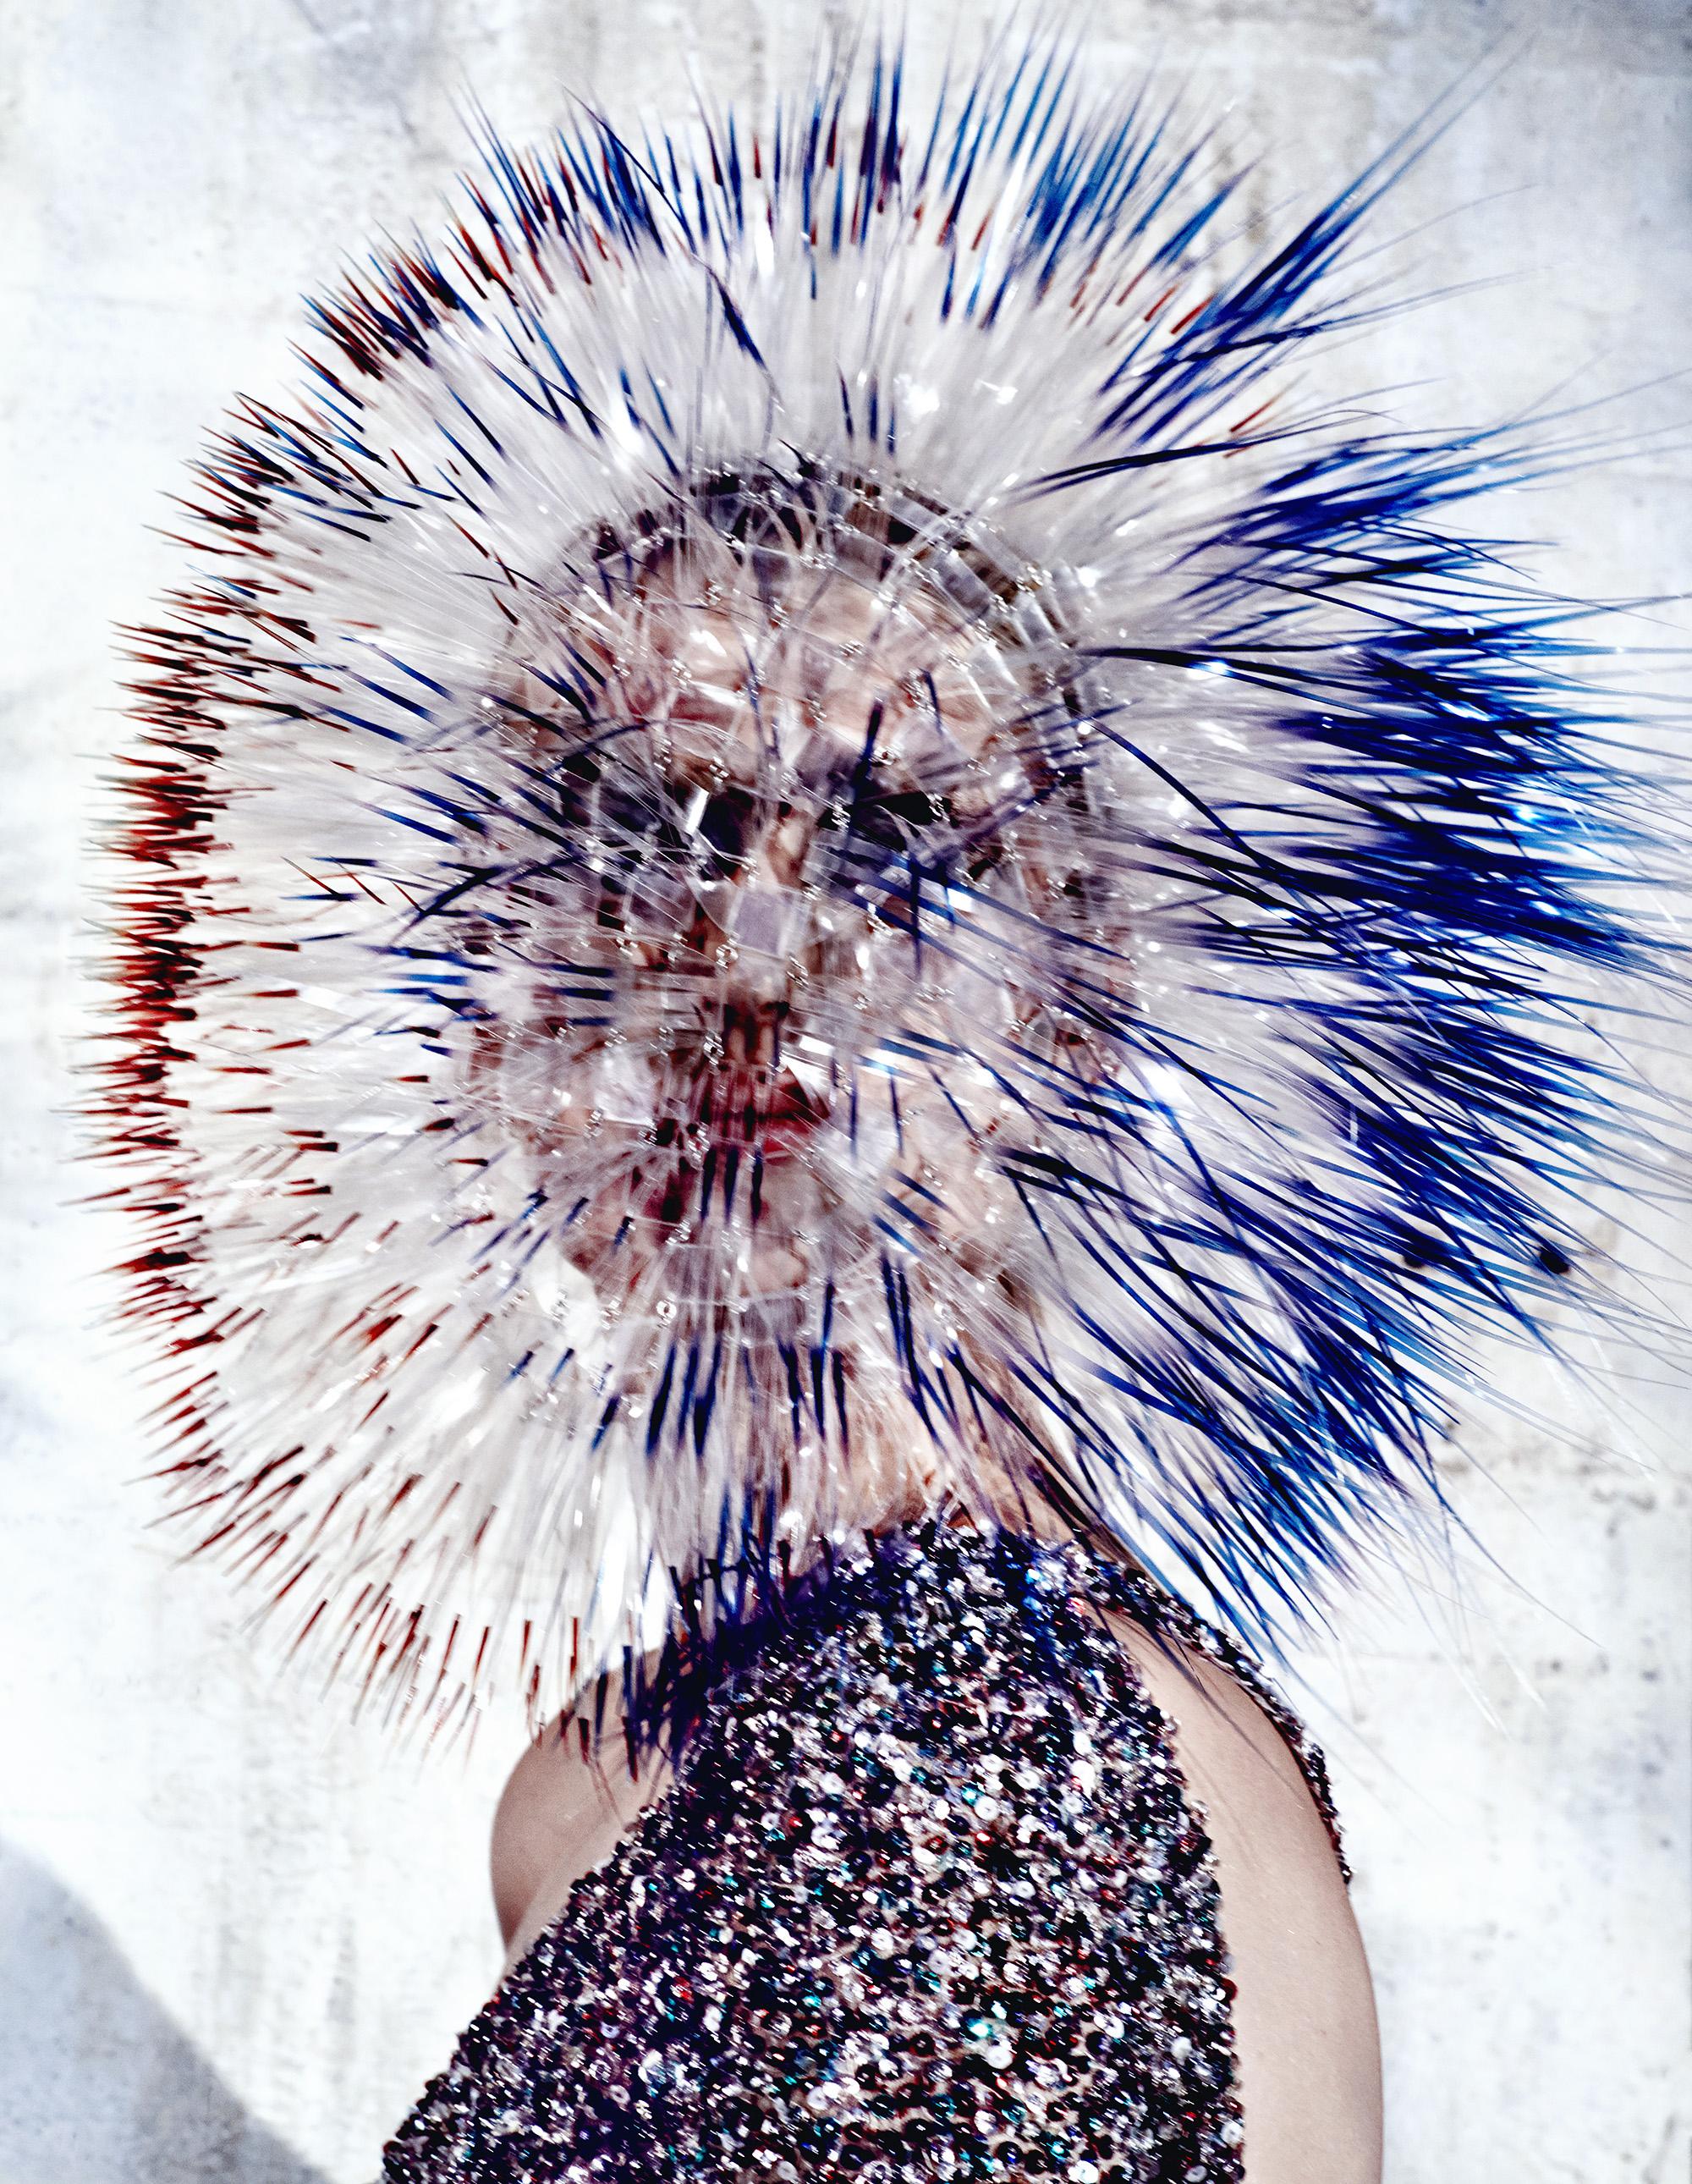 © Txema Yeste. Courtesy of Staley-Wise Gallery, New York.